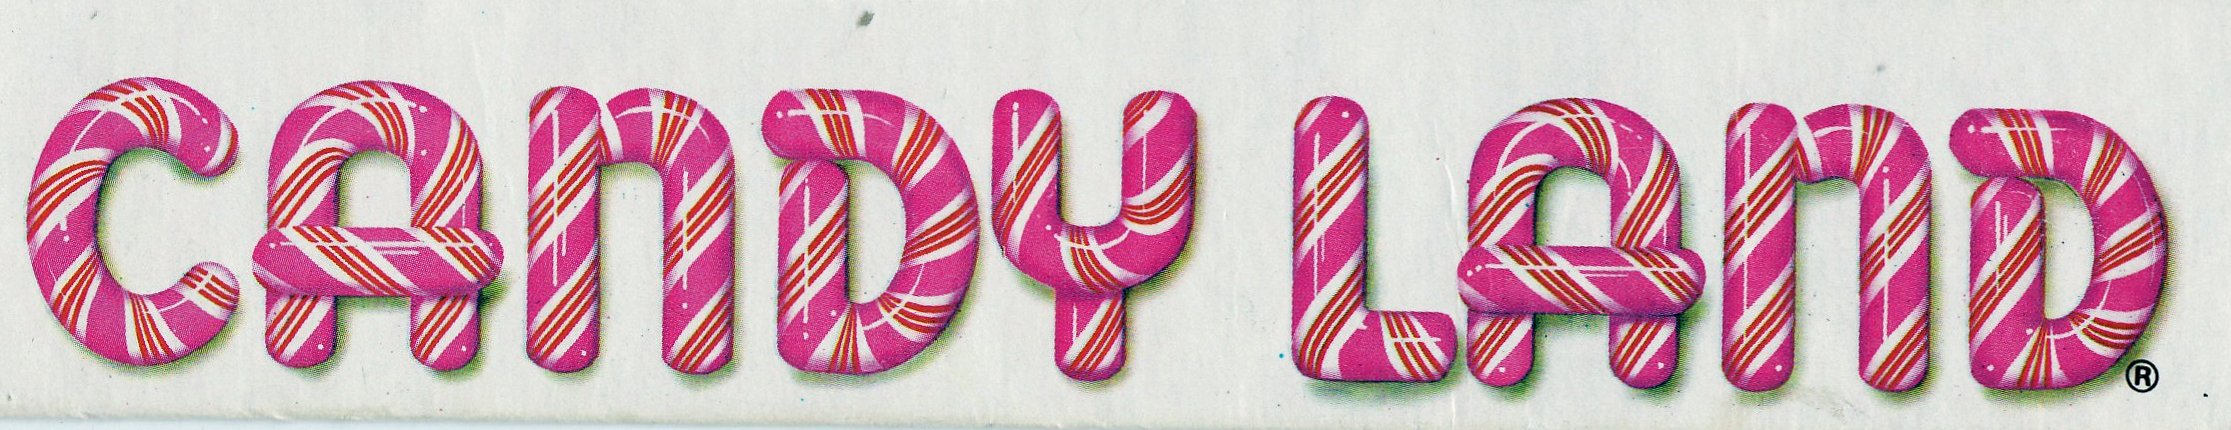 Candyland Logos.